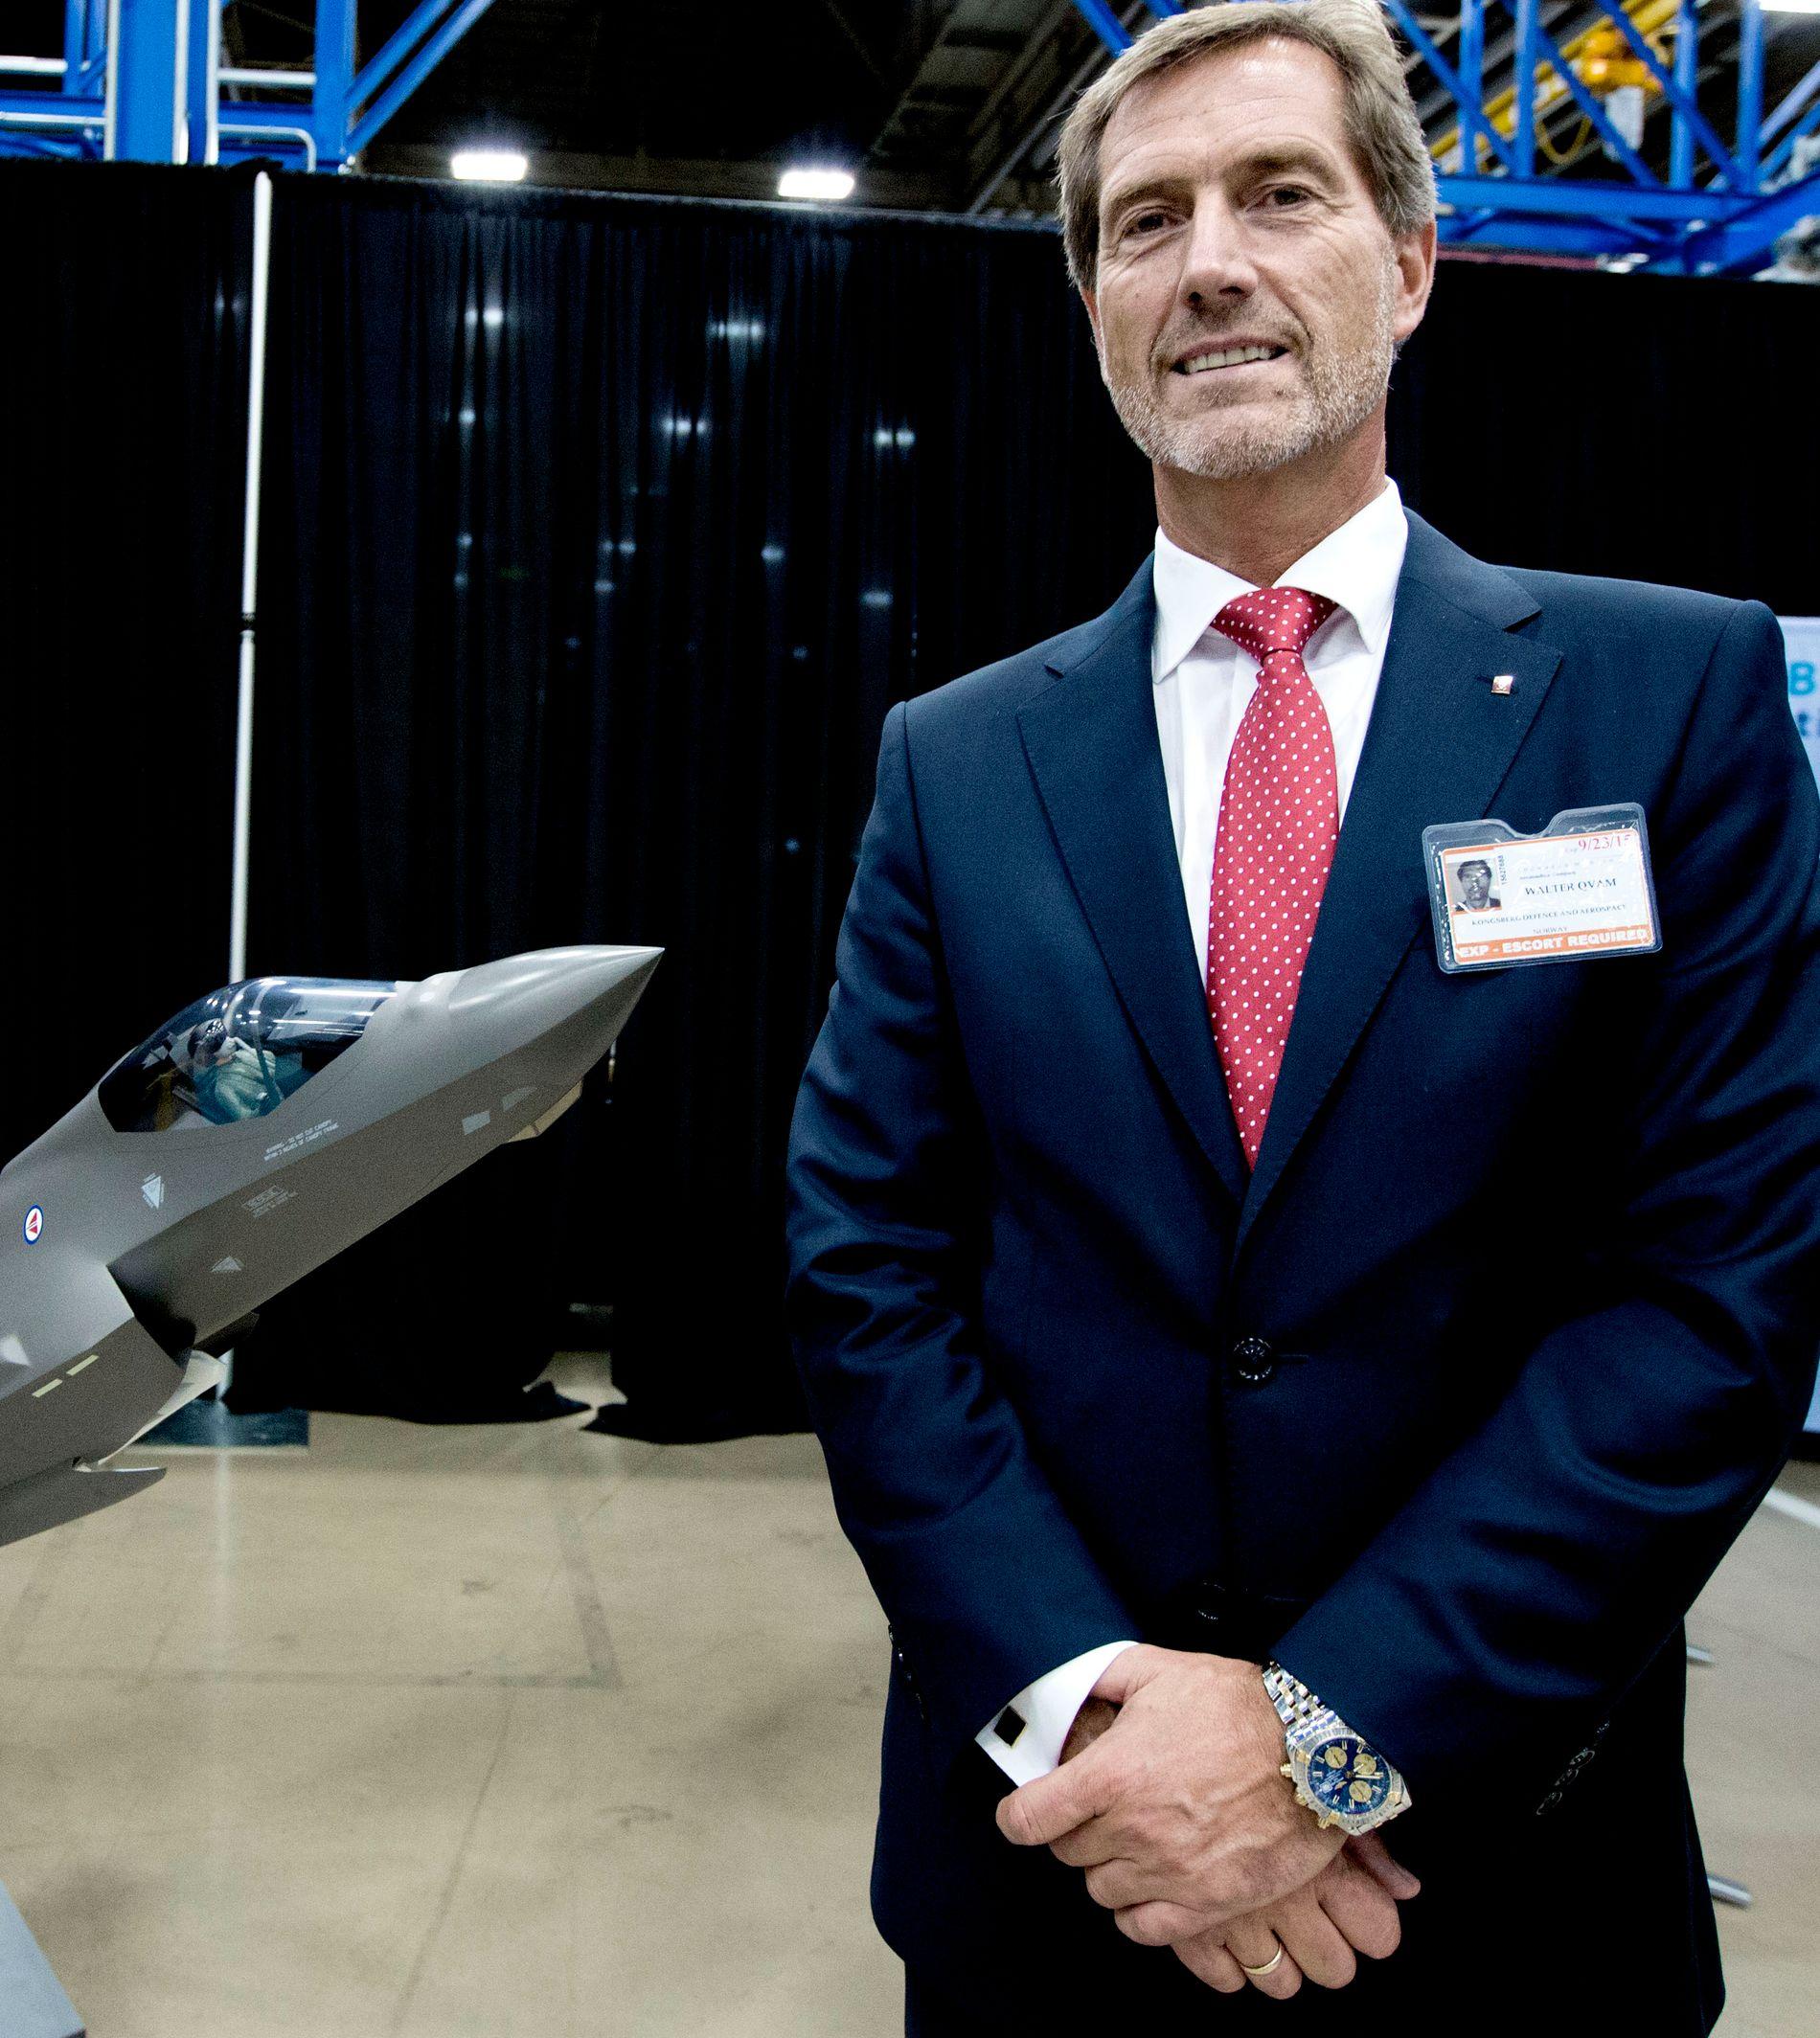 KONGSBERG-SJEF: Konsernsjef Walter Qvam i Kongsberg Gruppen fotografert på Lockheed Martin-fabrikken i USA der Norges nye F-35 kampflye produseres.